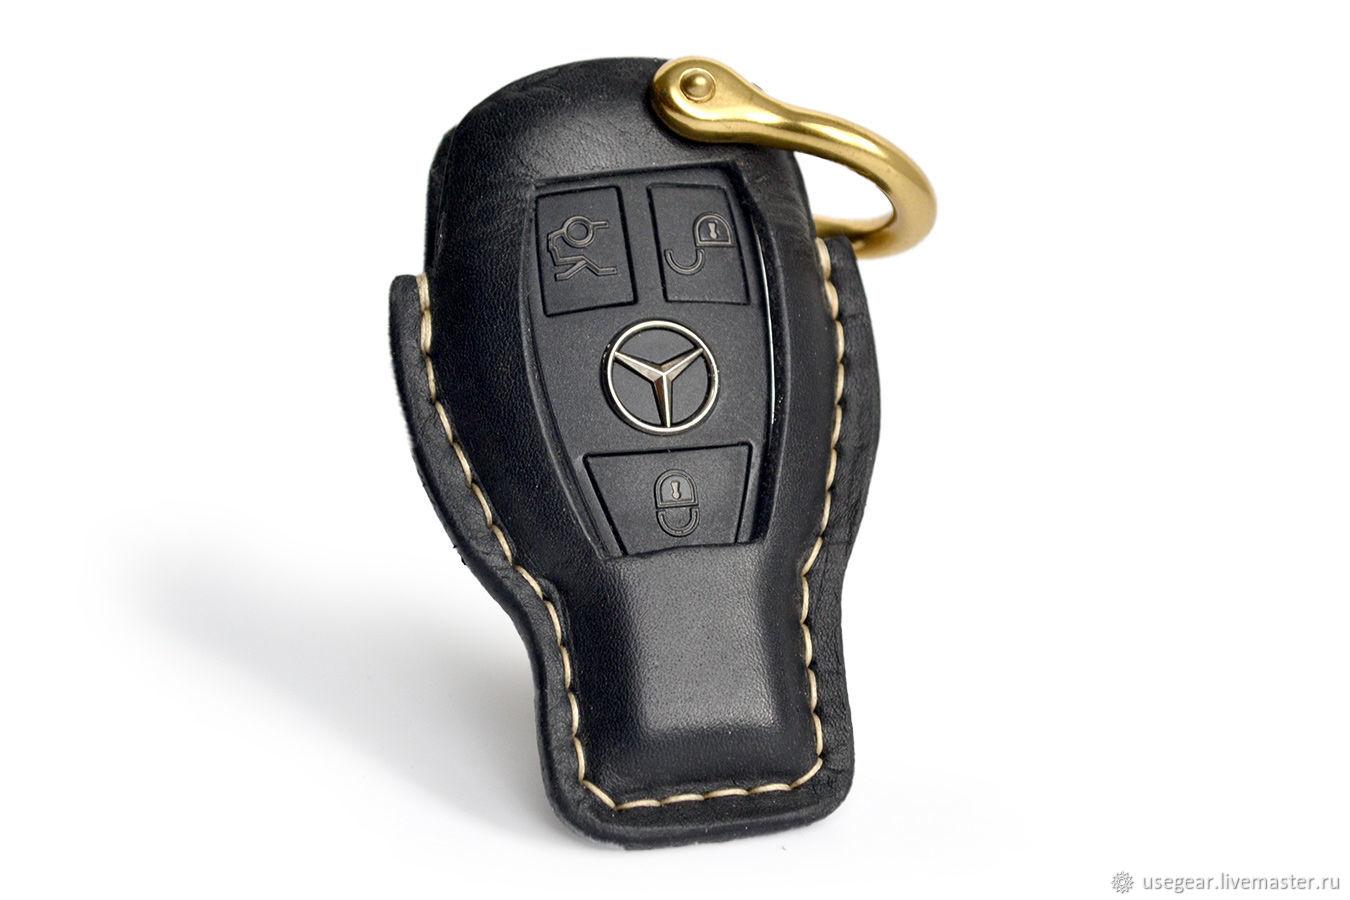 Чехол Skin для ключа Mercedes, Ключницы, Москва,  Фото №1